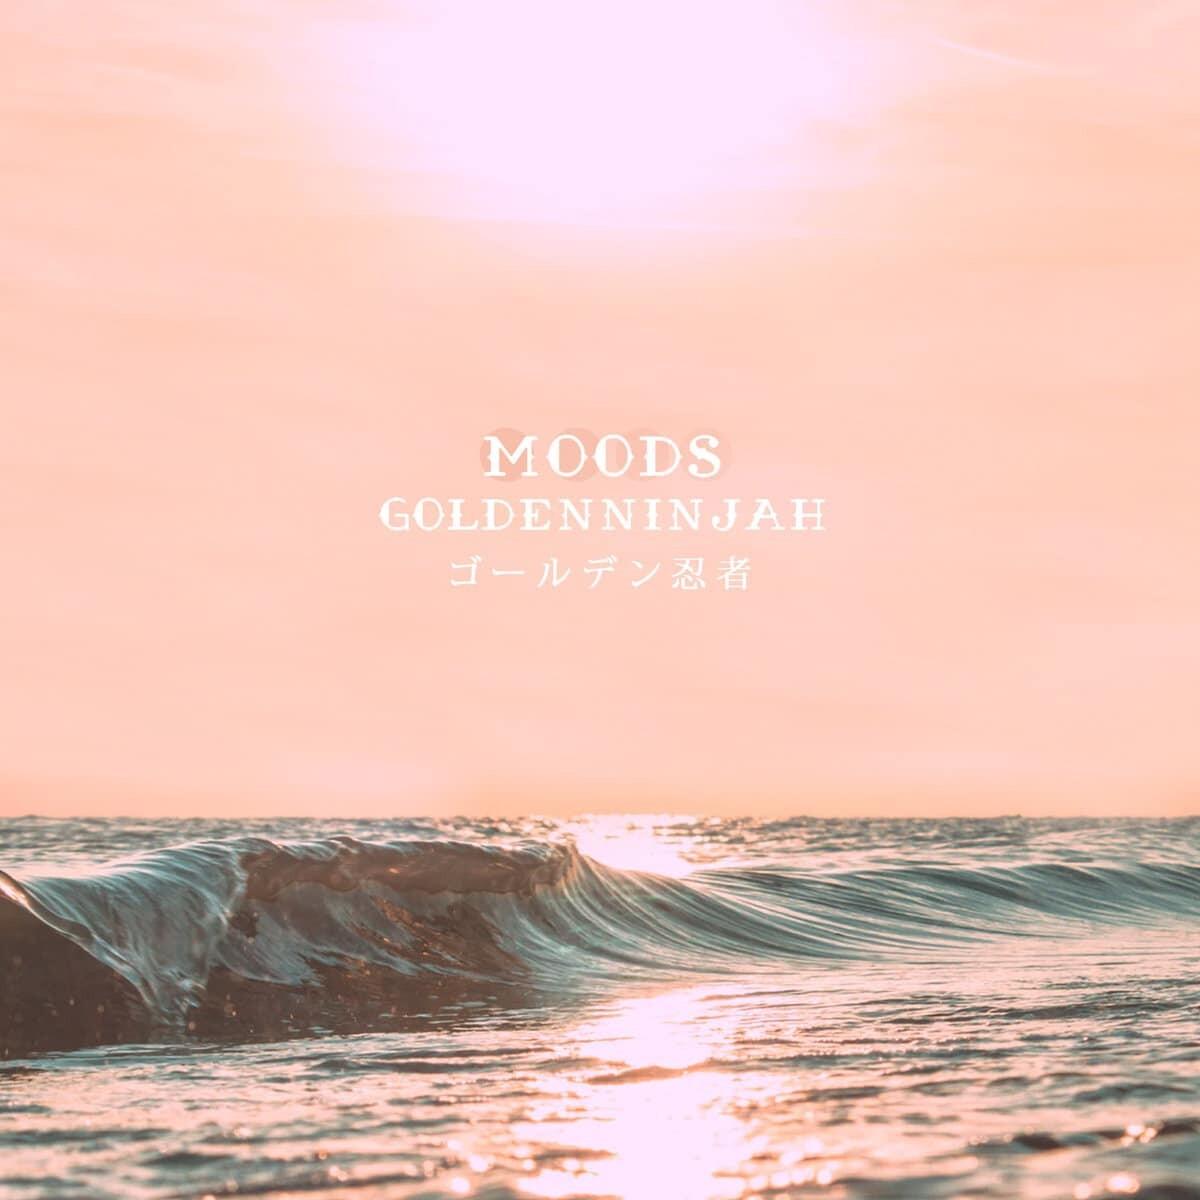 goldenninjah - Moods